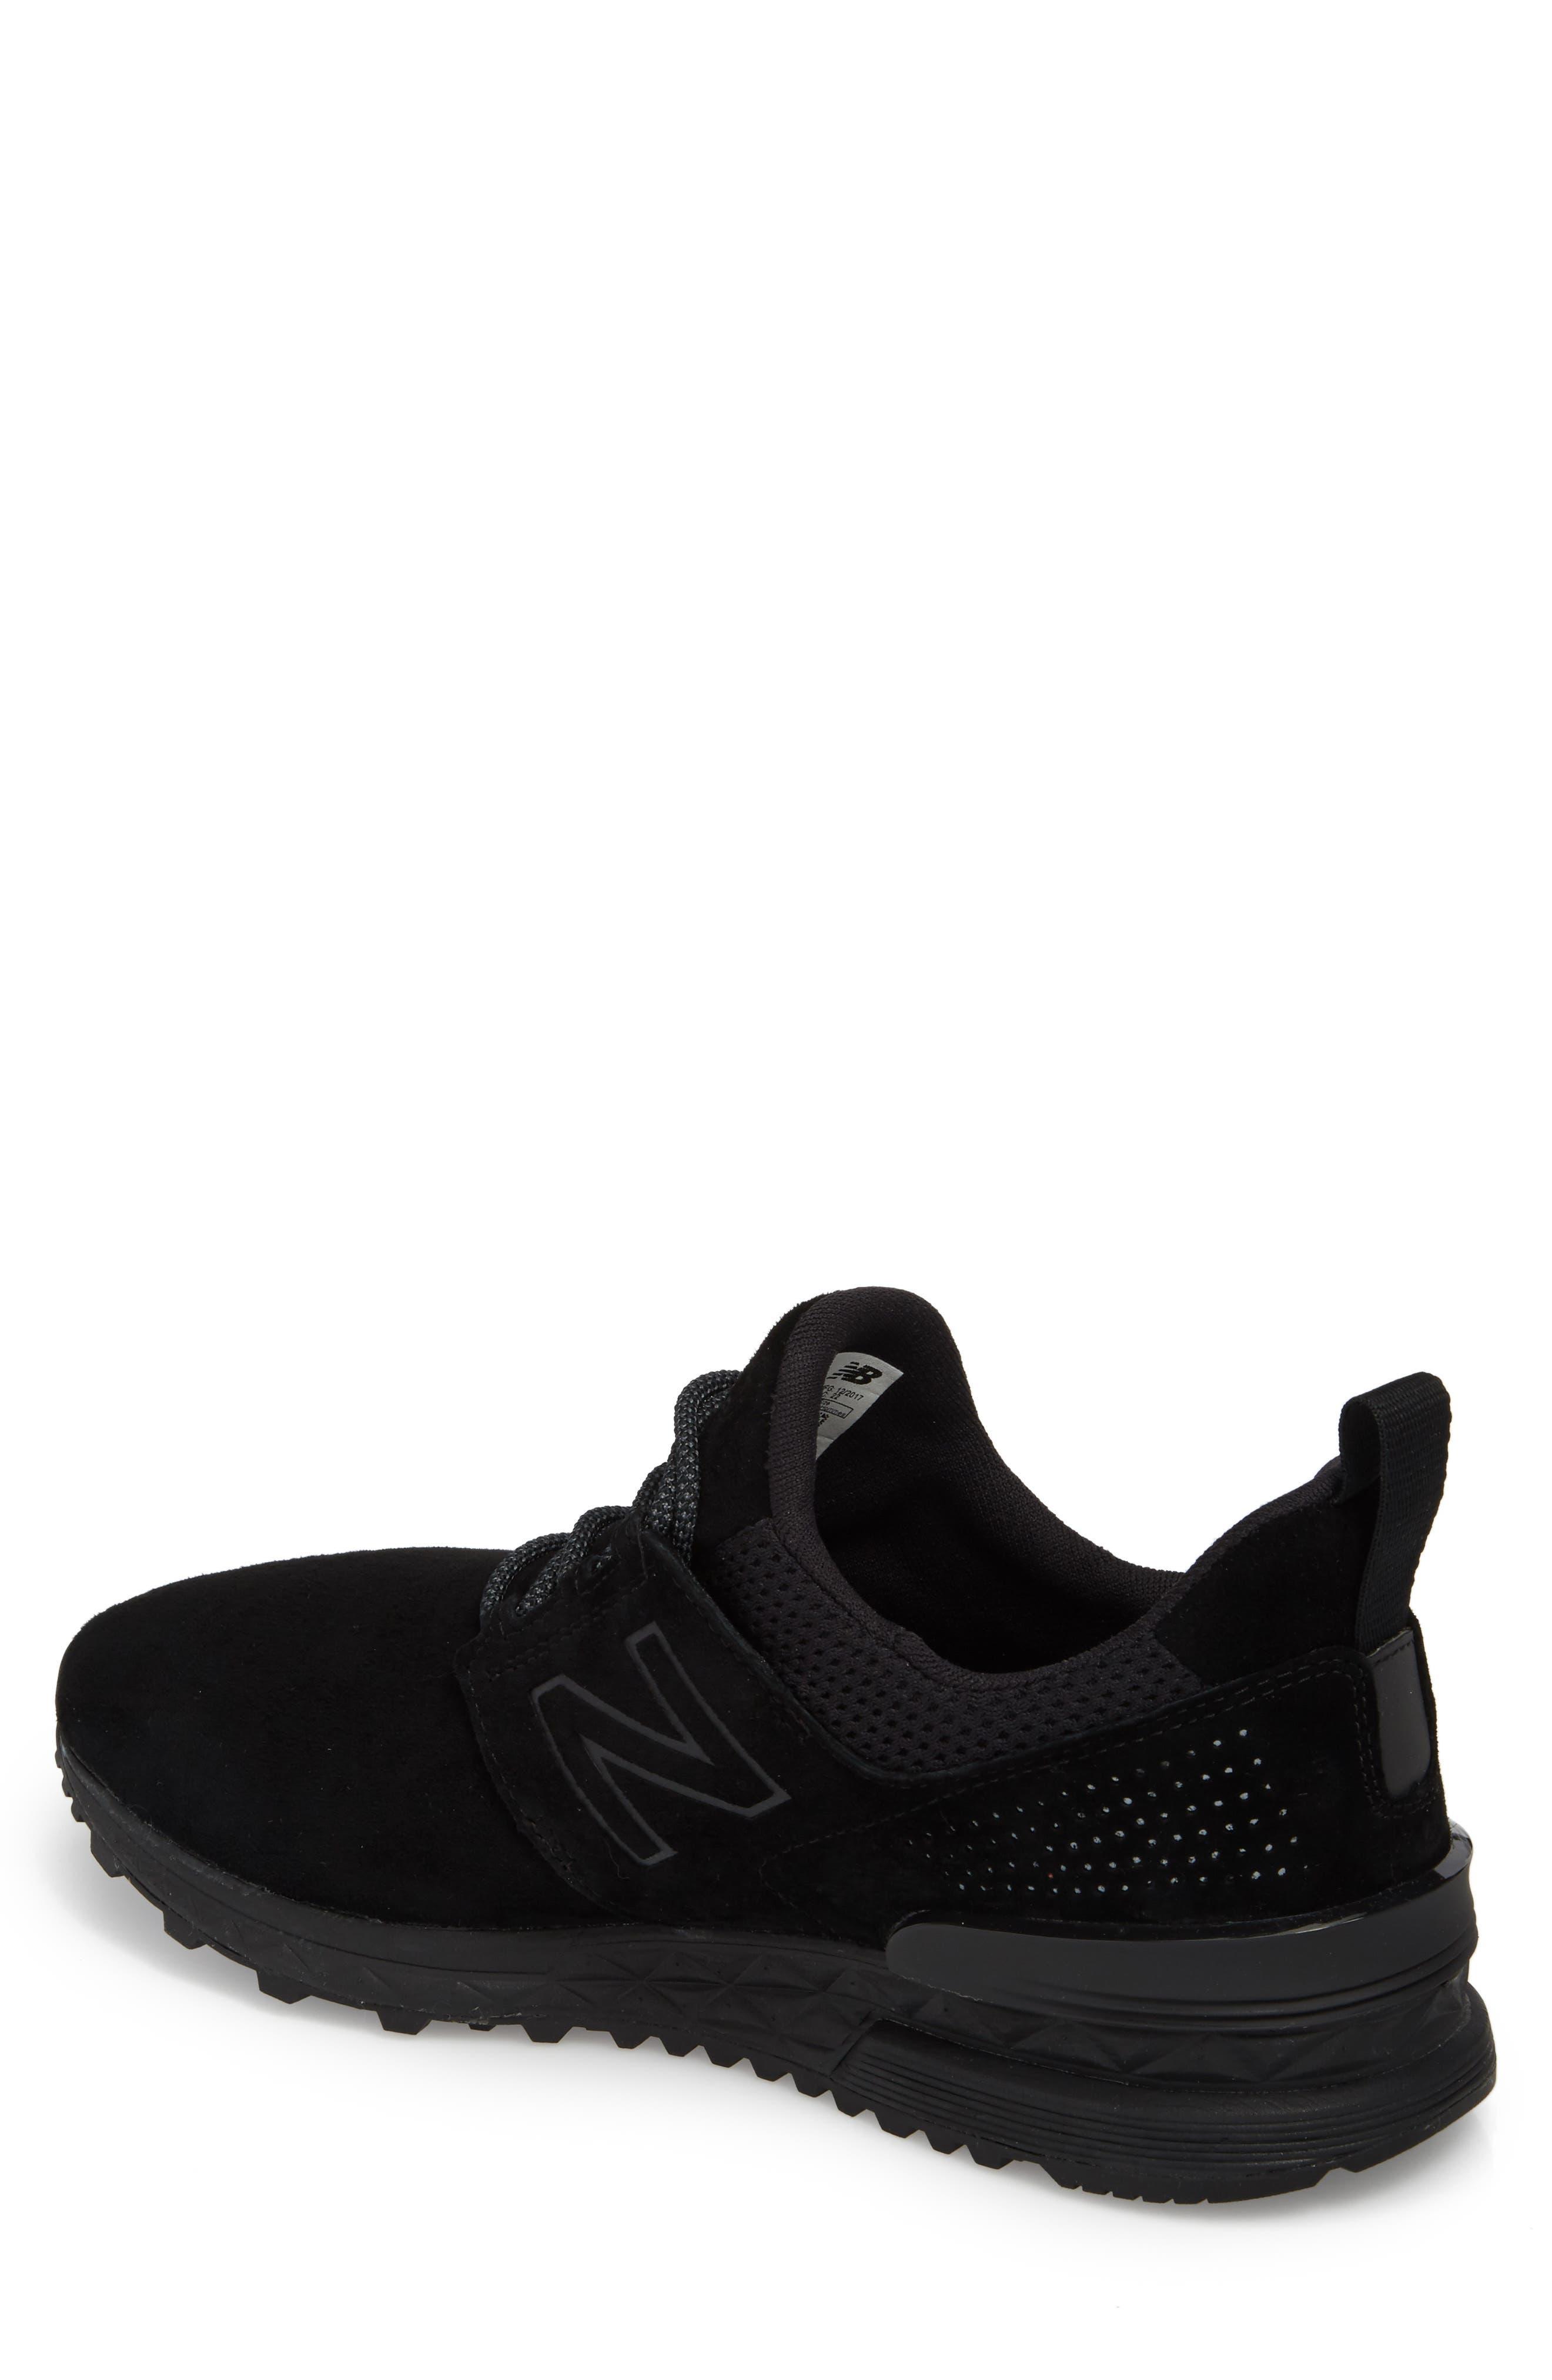 574 Decon Sneaker,                             Alternate thumbnail 2, color,                             001